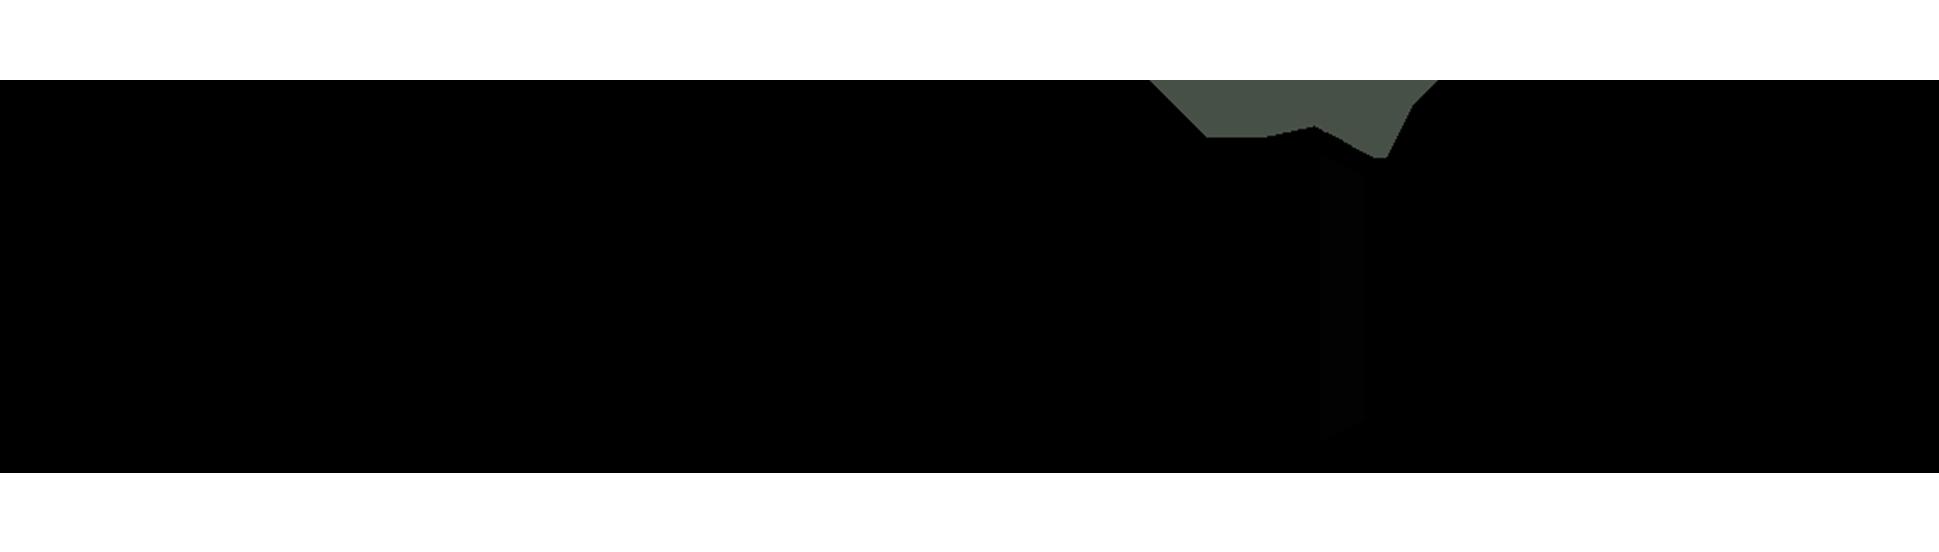 neoltih_web